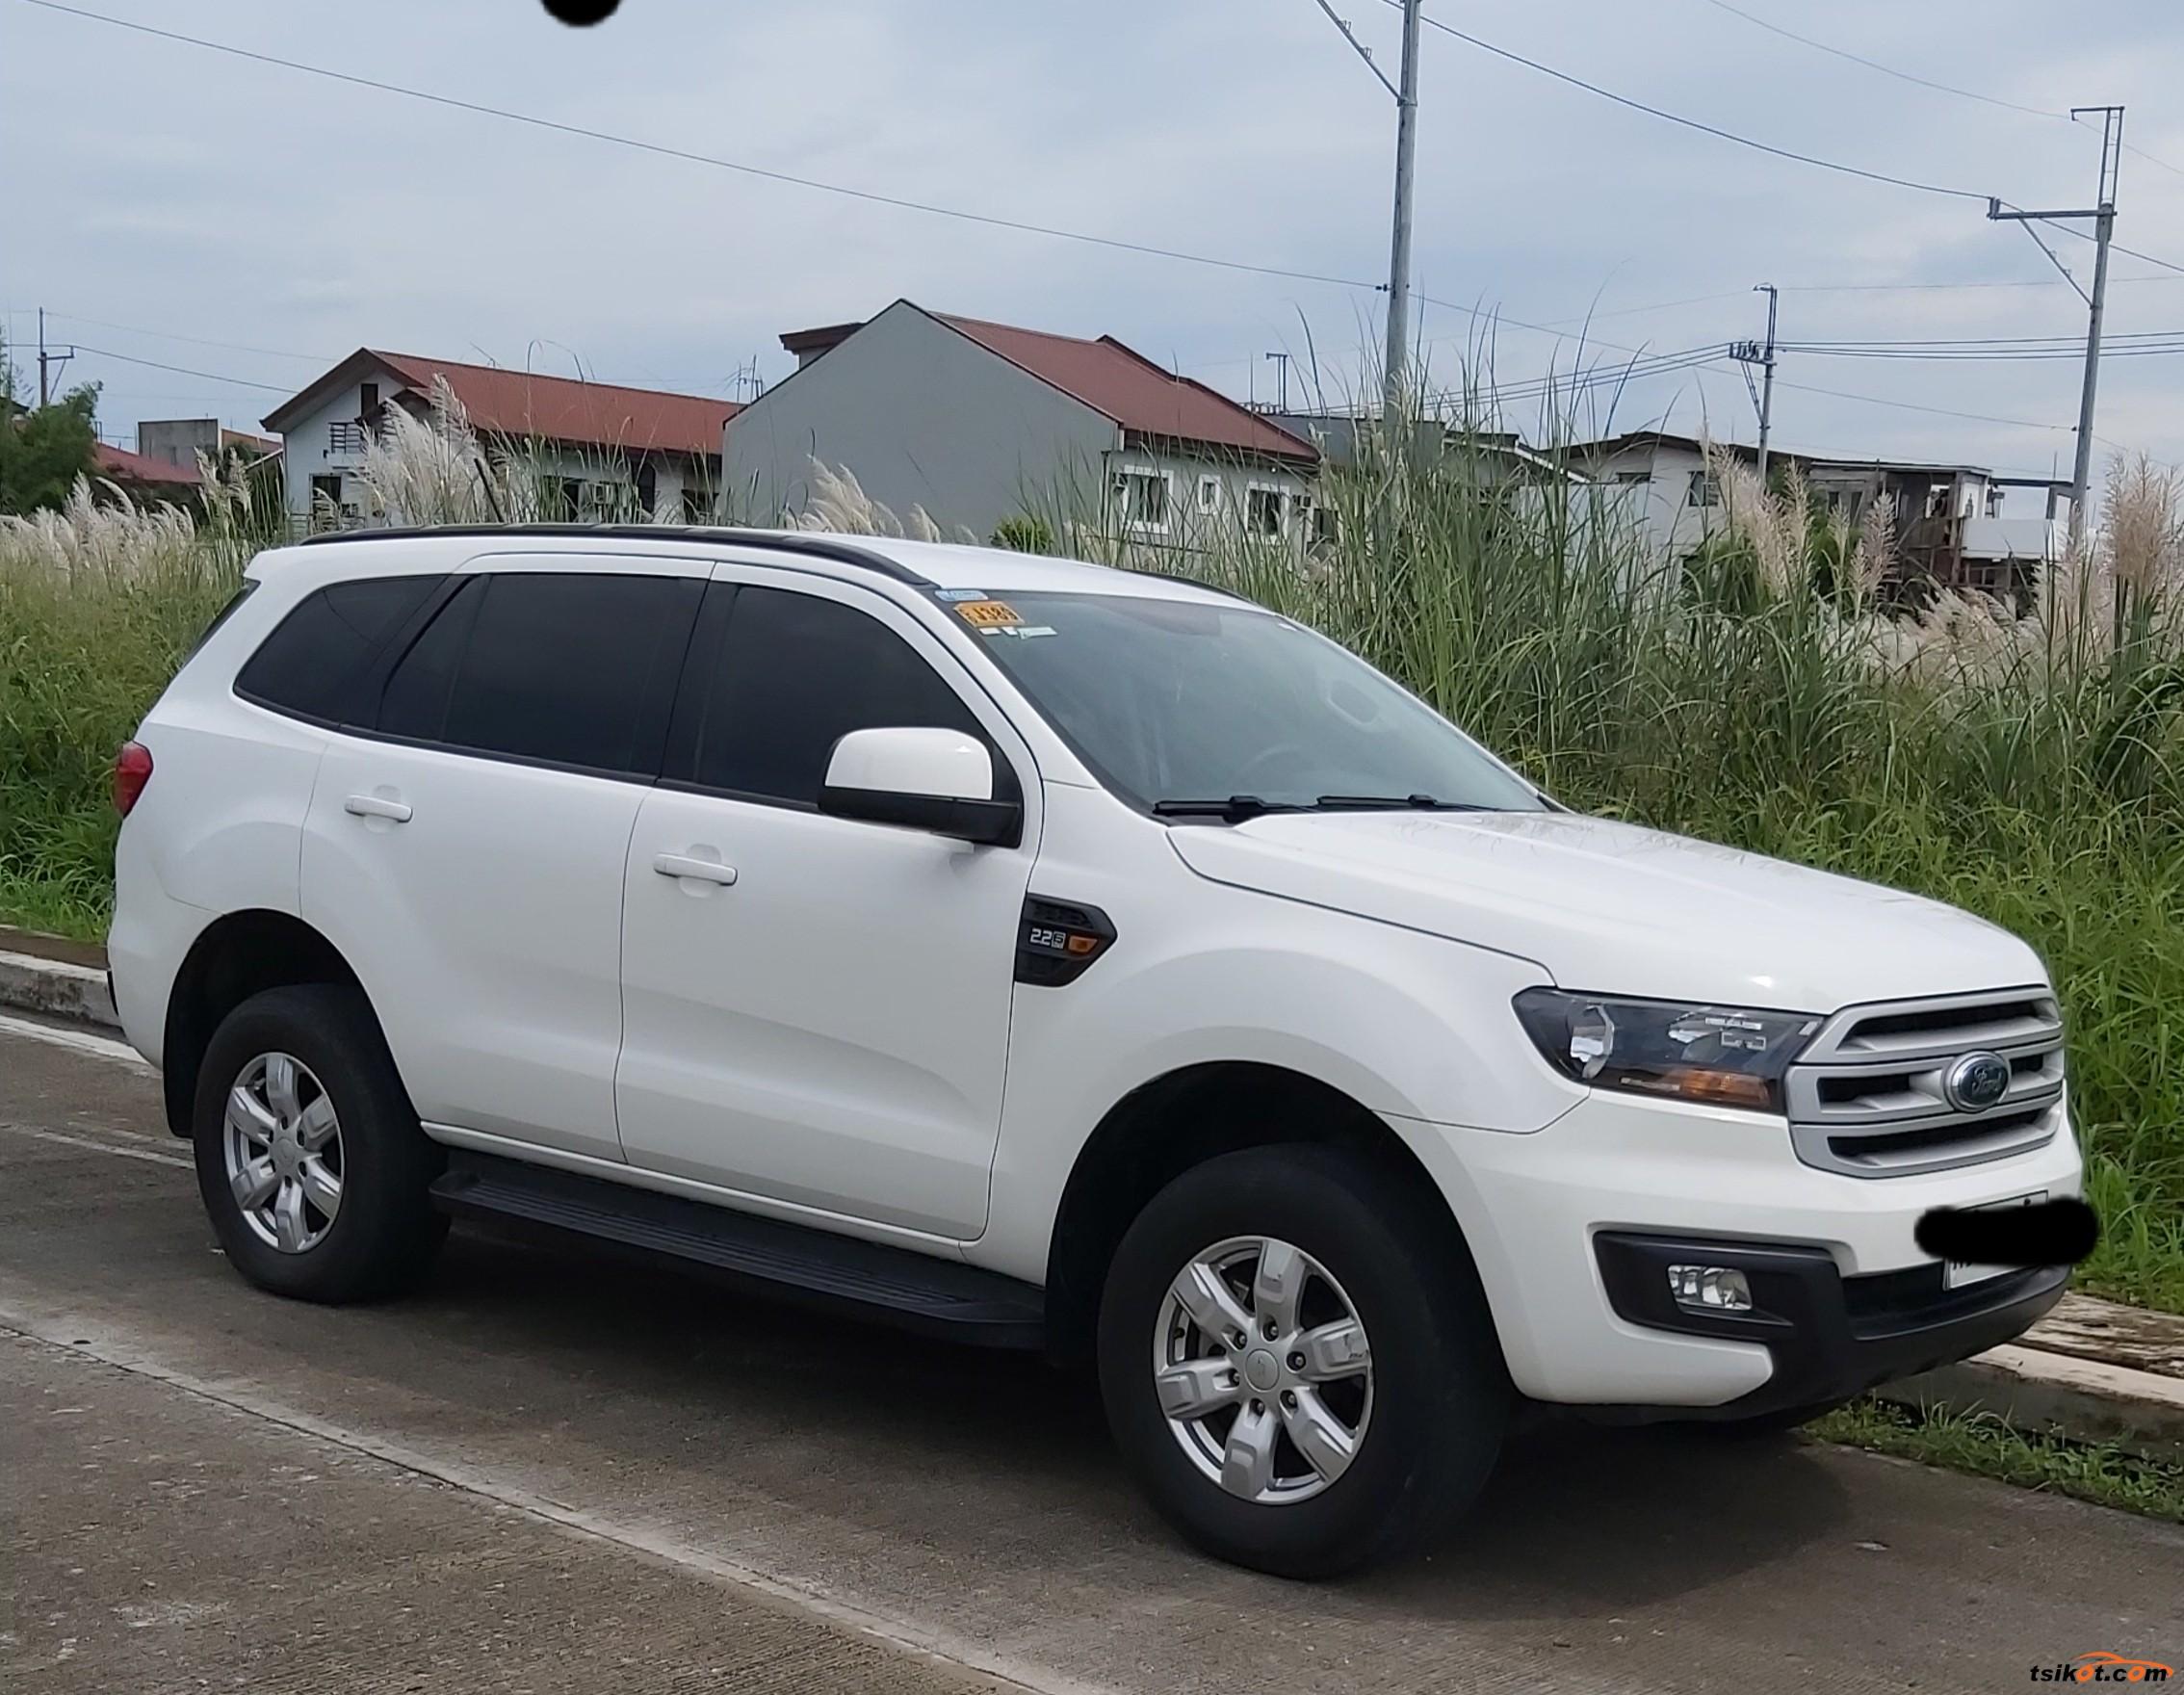 Ford Everest 2017 - 2